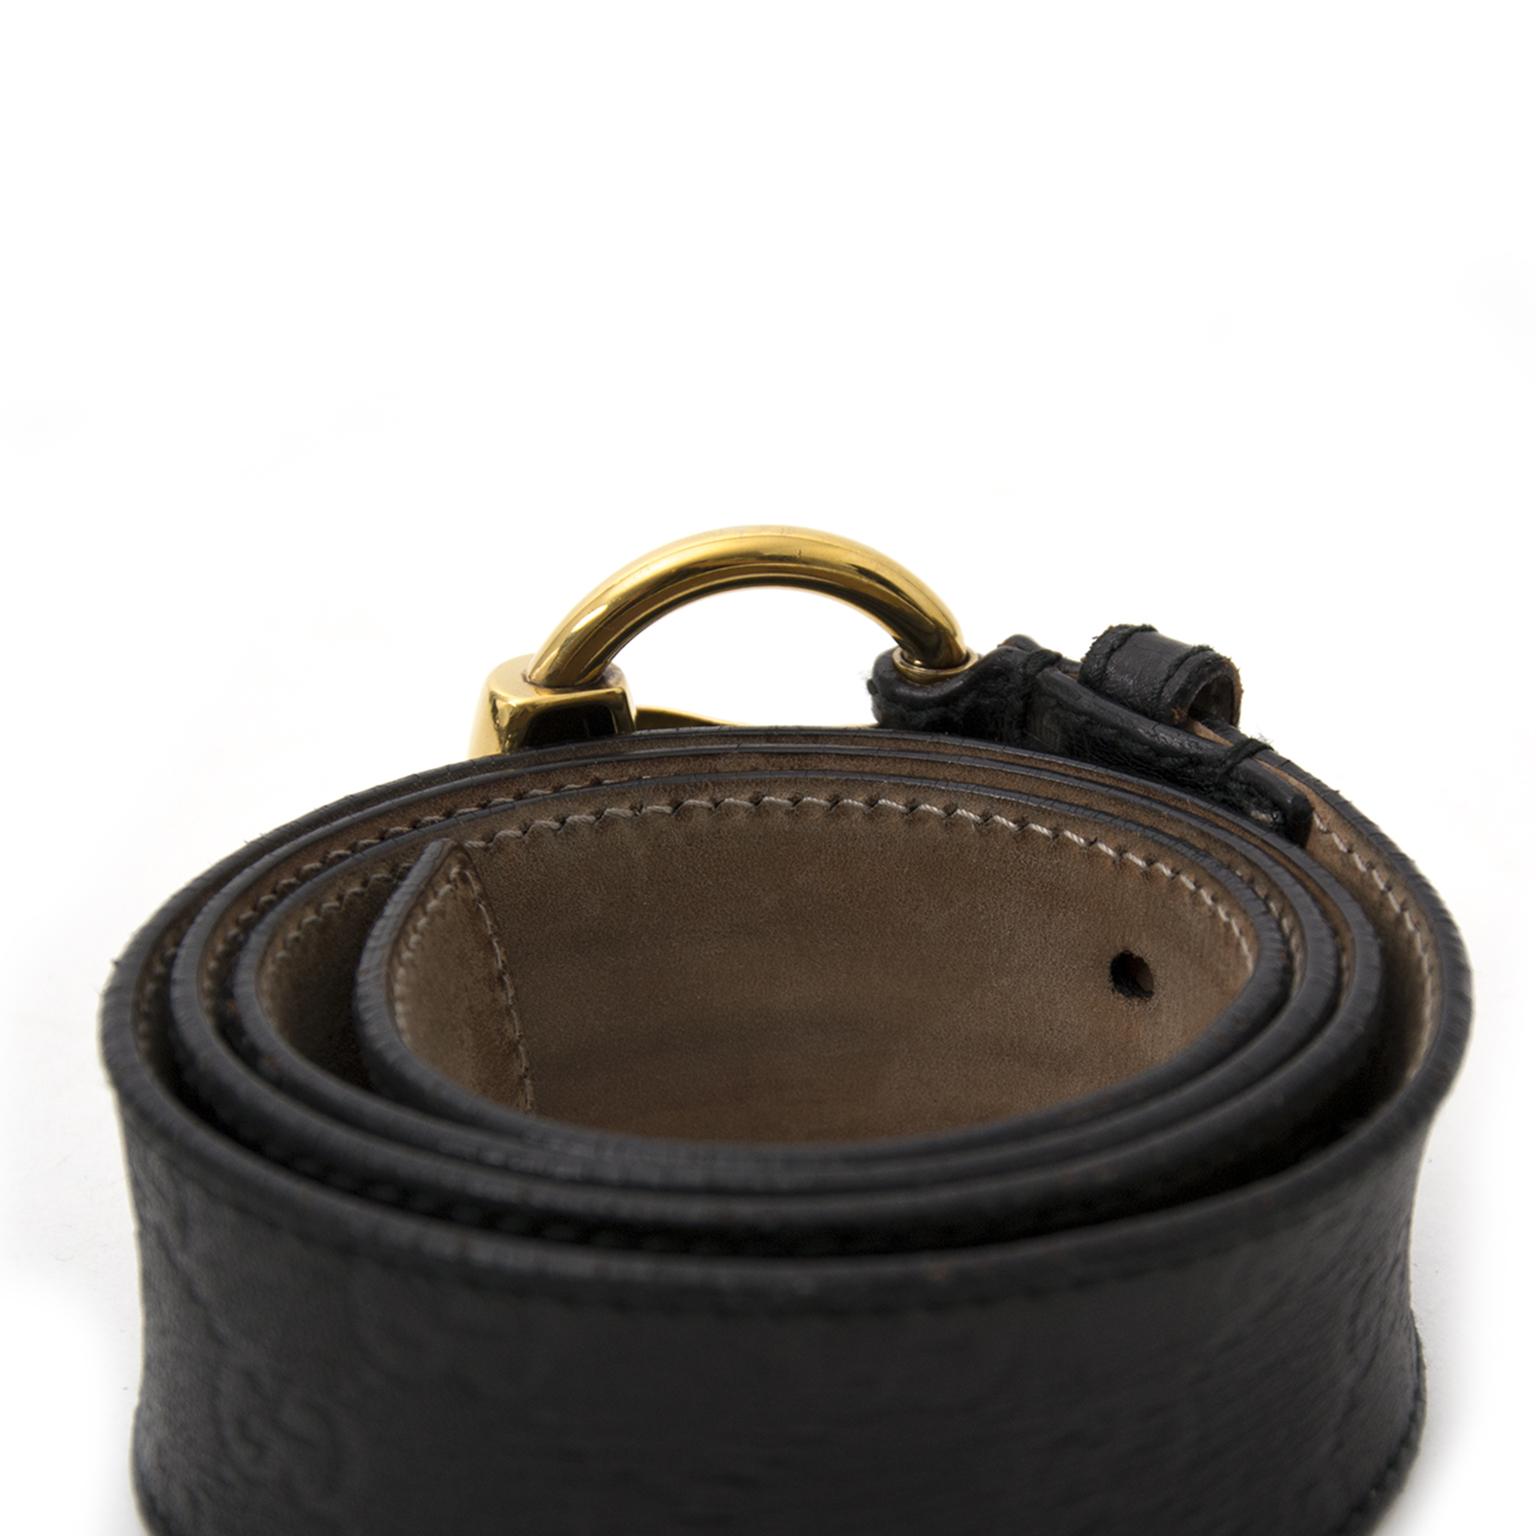 f418116f546 Gucci Black Leather Monogram Belt acheter en ligne seconde main shop safe  online Gucci Black Leather Monogram Belt second hand